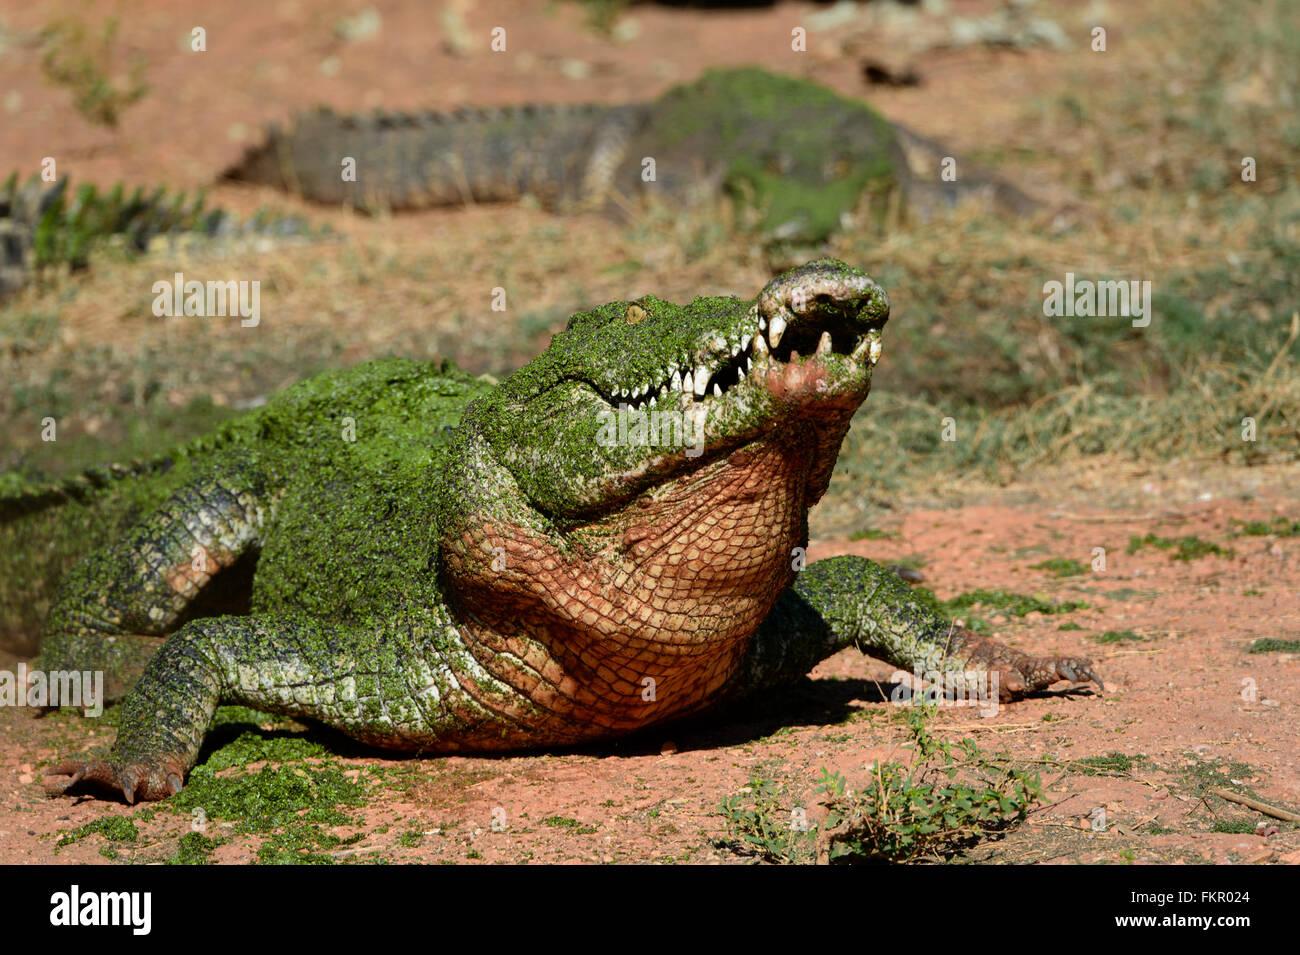 Saltwater Crocodile (Crocodylus porosus), Broome Wildlife Park, Western Australia - Stock Image